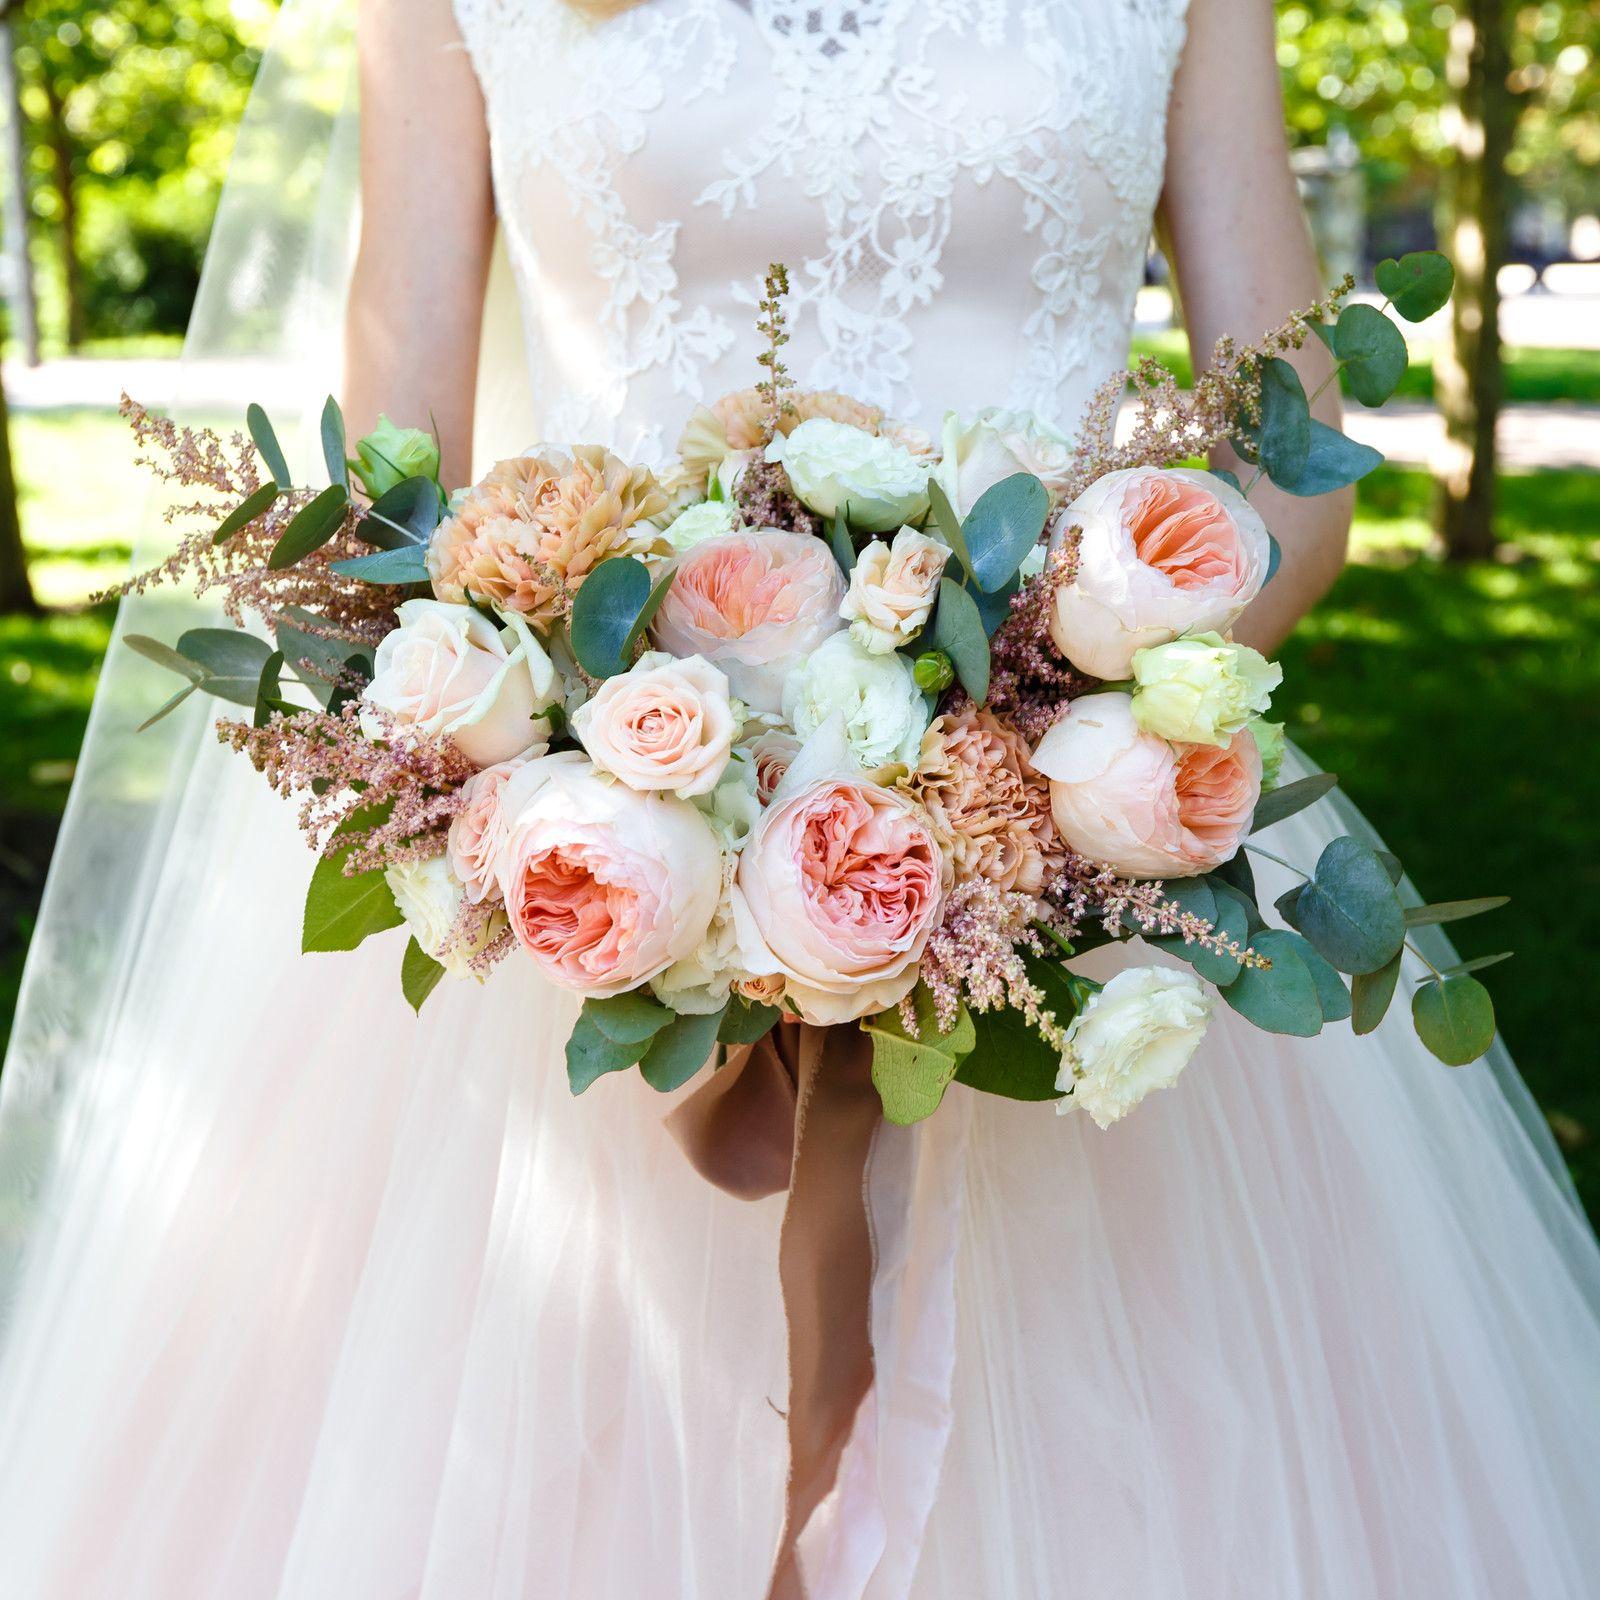 Boothbay Harbor Wedding Planner And Florist. Destination